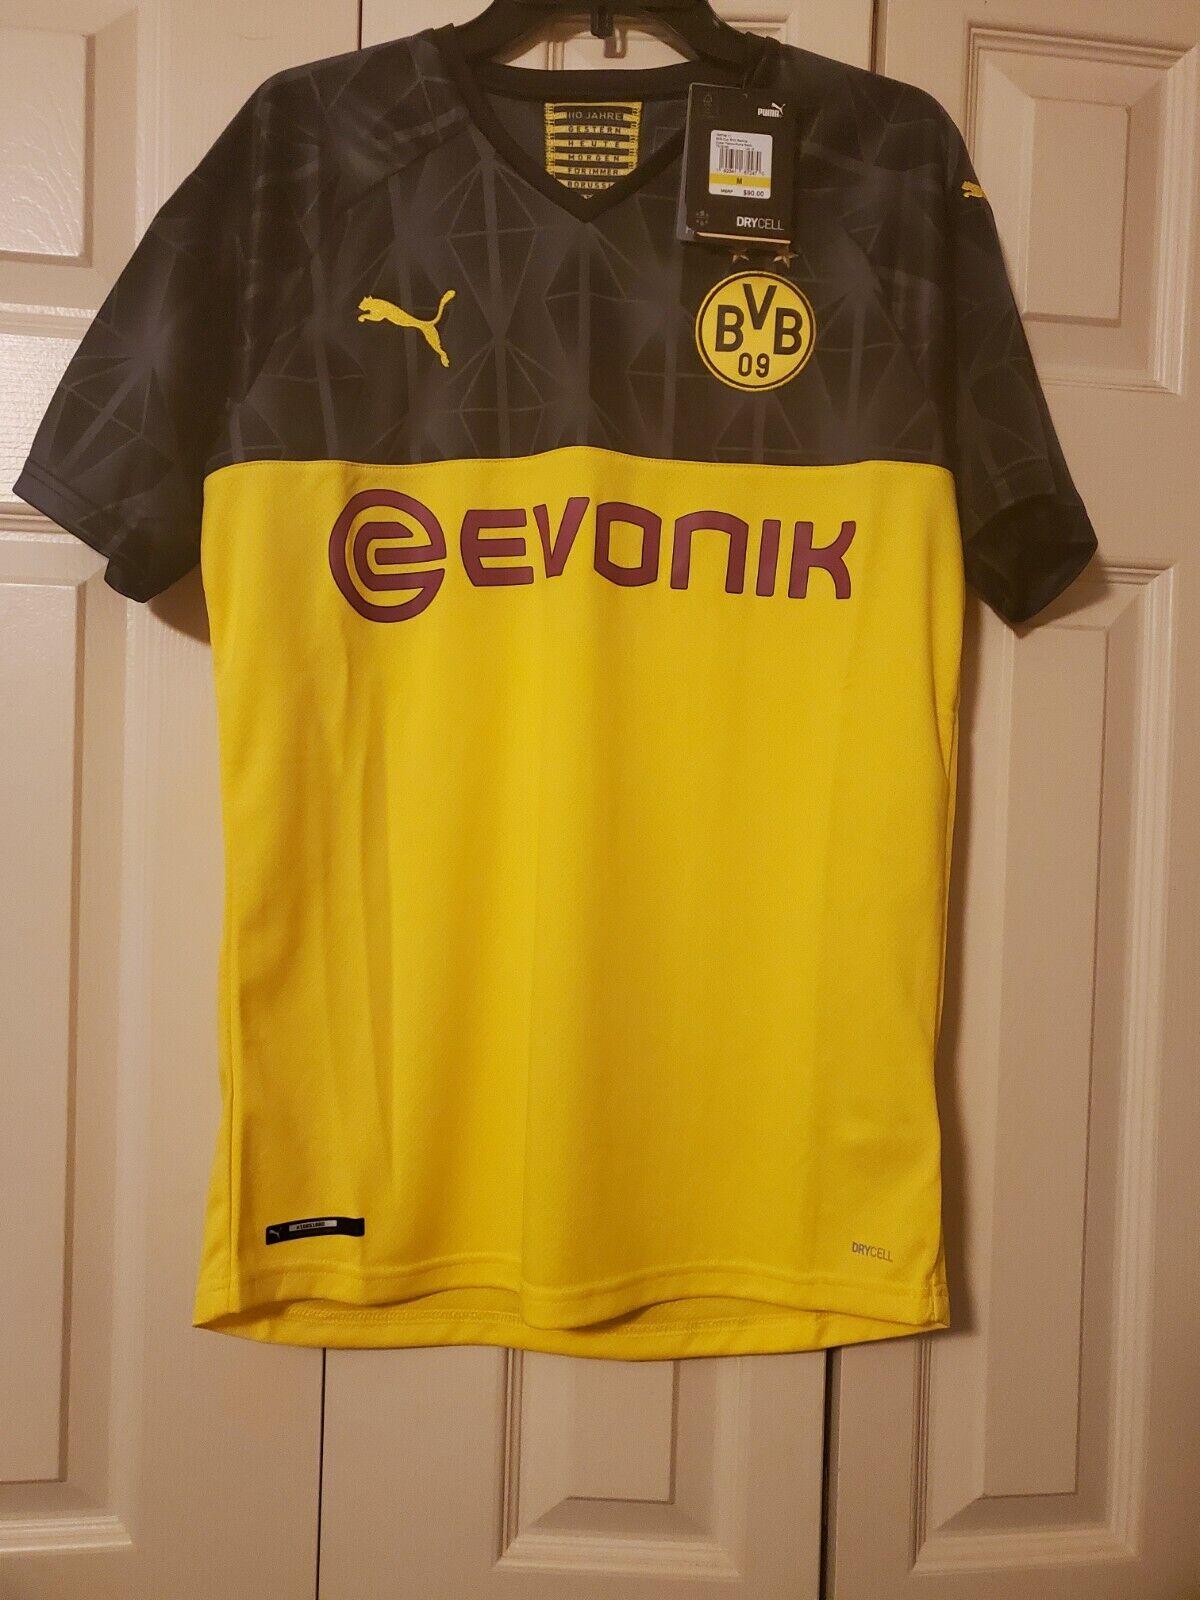 Puma Borussia Dortmund Away Stadium Jersey 14 15 Black Yellow Mens S Reus Name For Sale Online Ebay